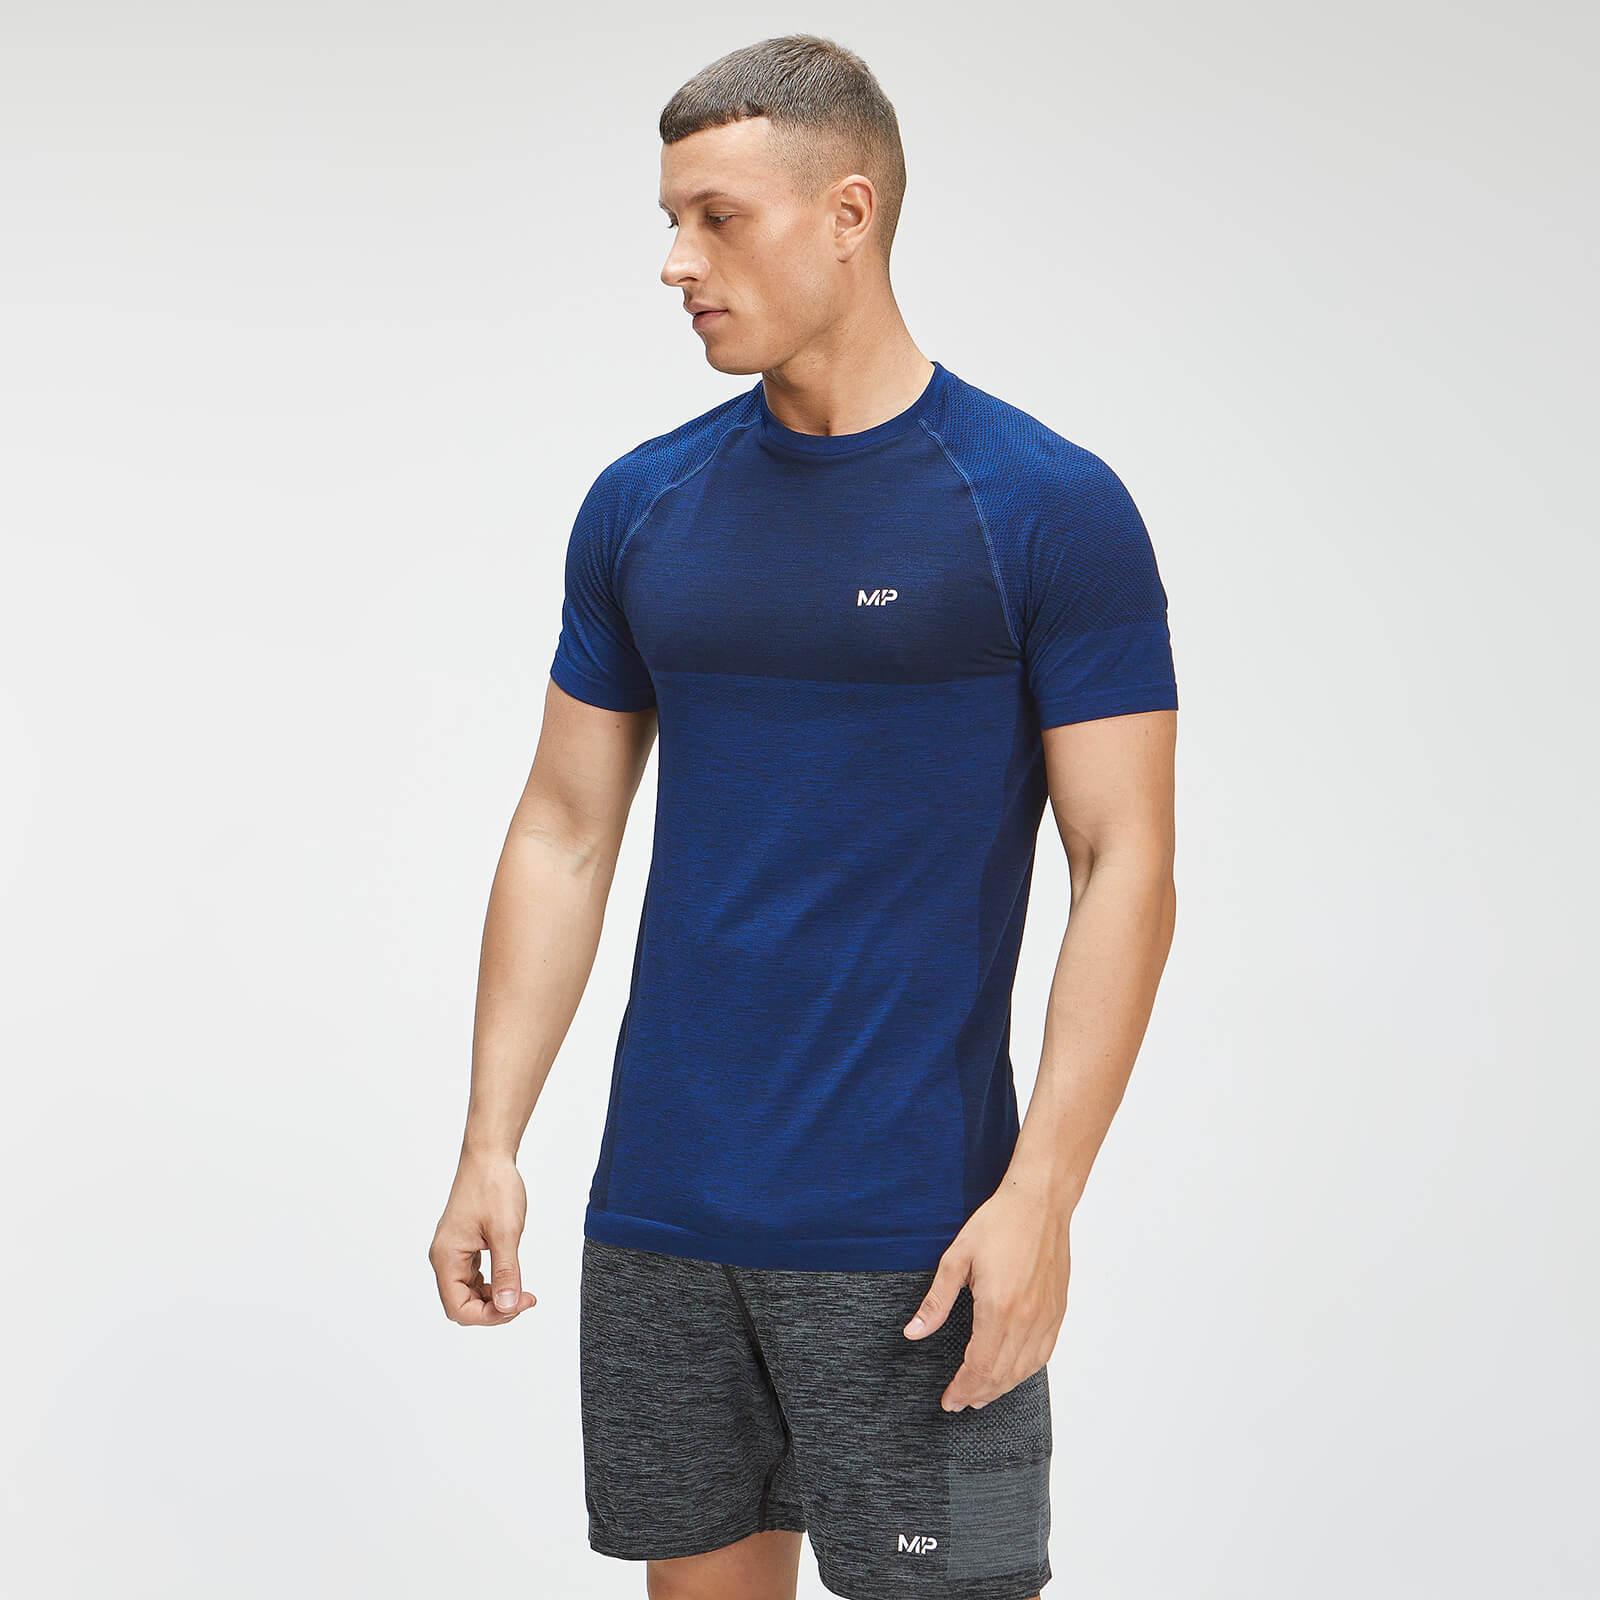 MP Men's Essential Seamless Short Sleeve T-Shirt - Intense Blue Marl - M, Myprotein International  - купить со скидкой